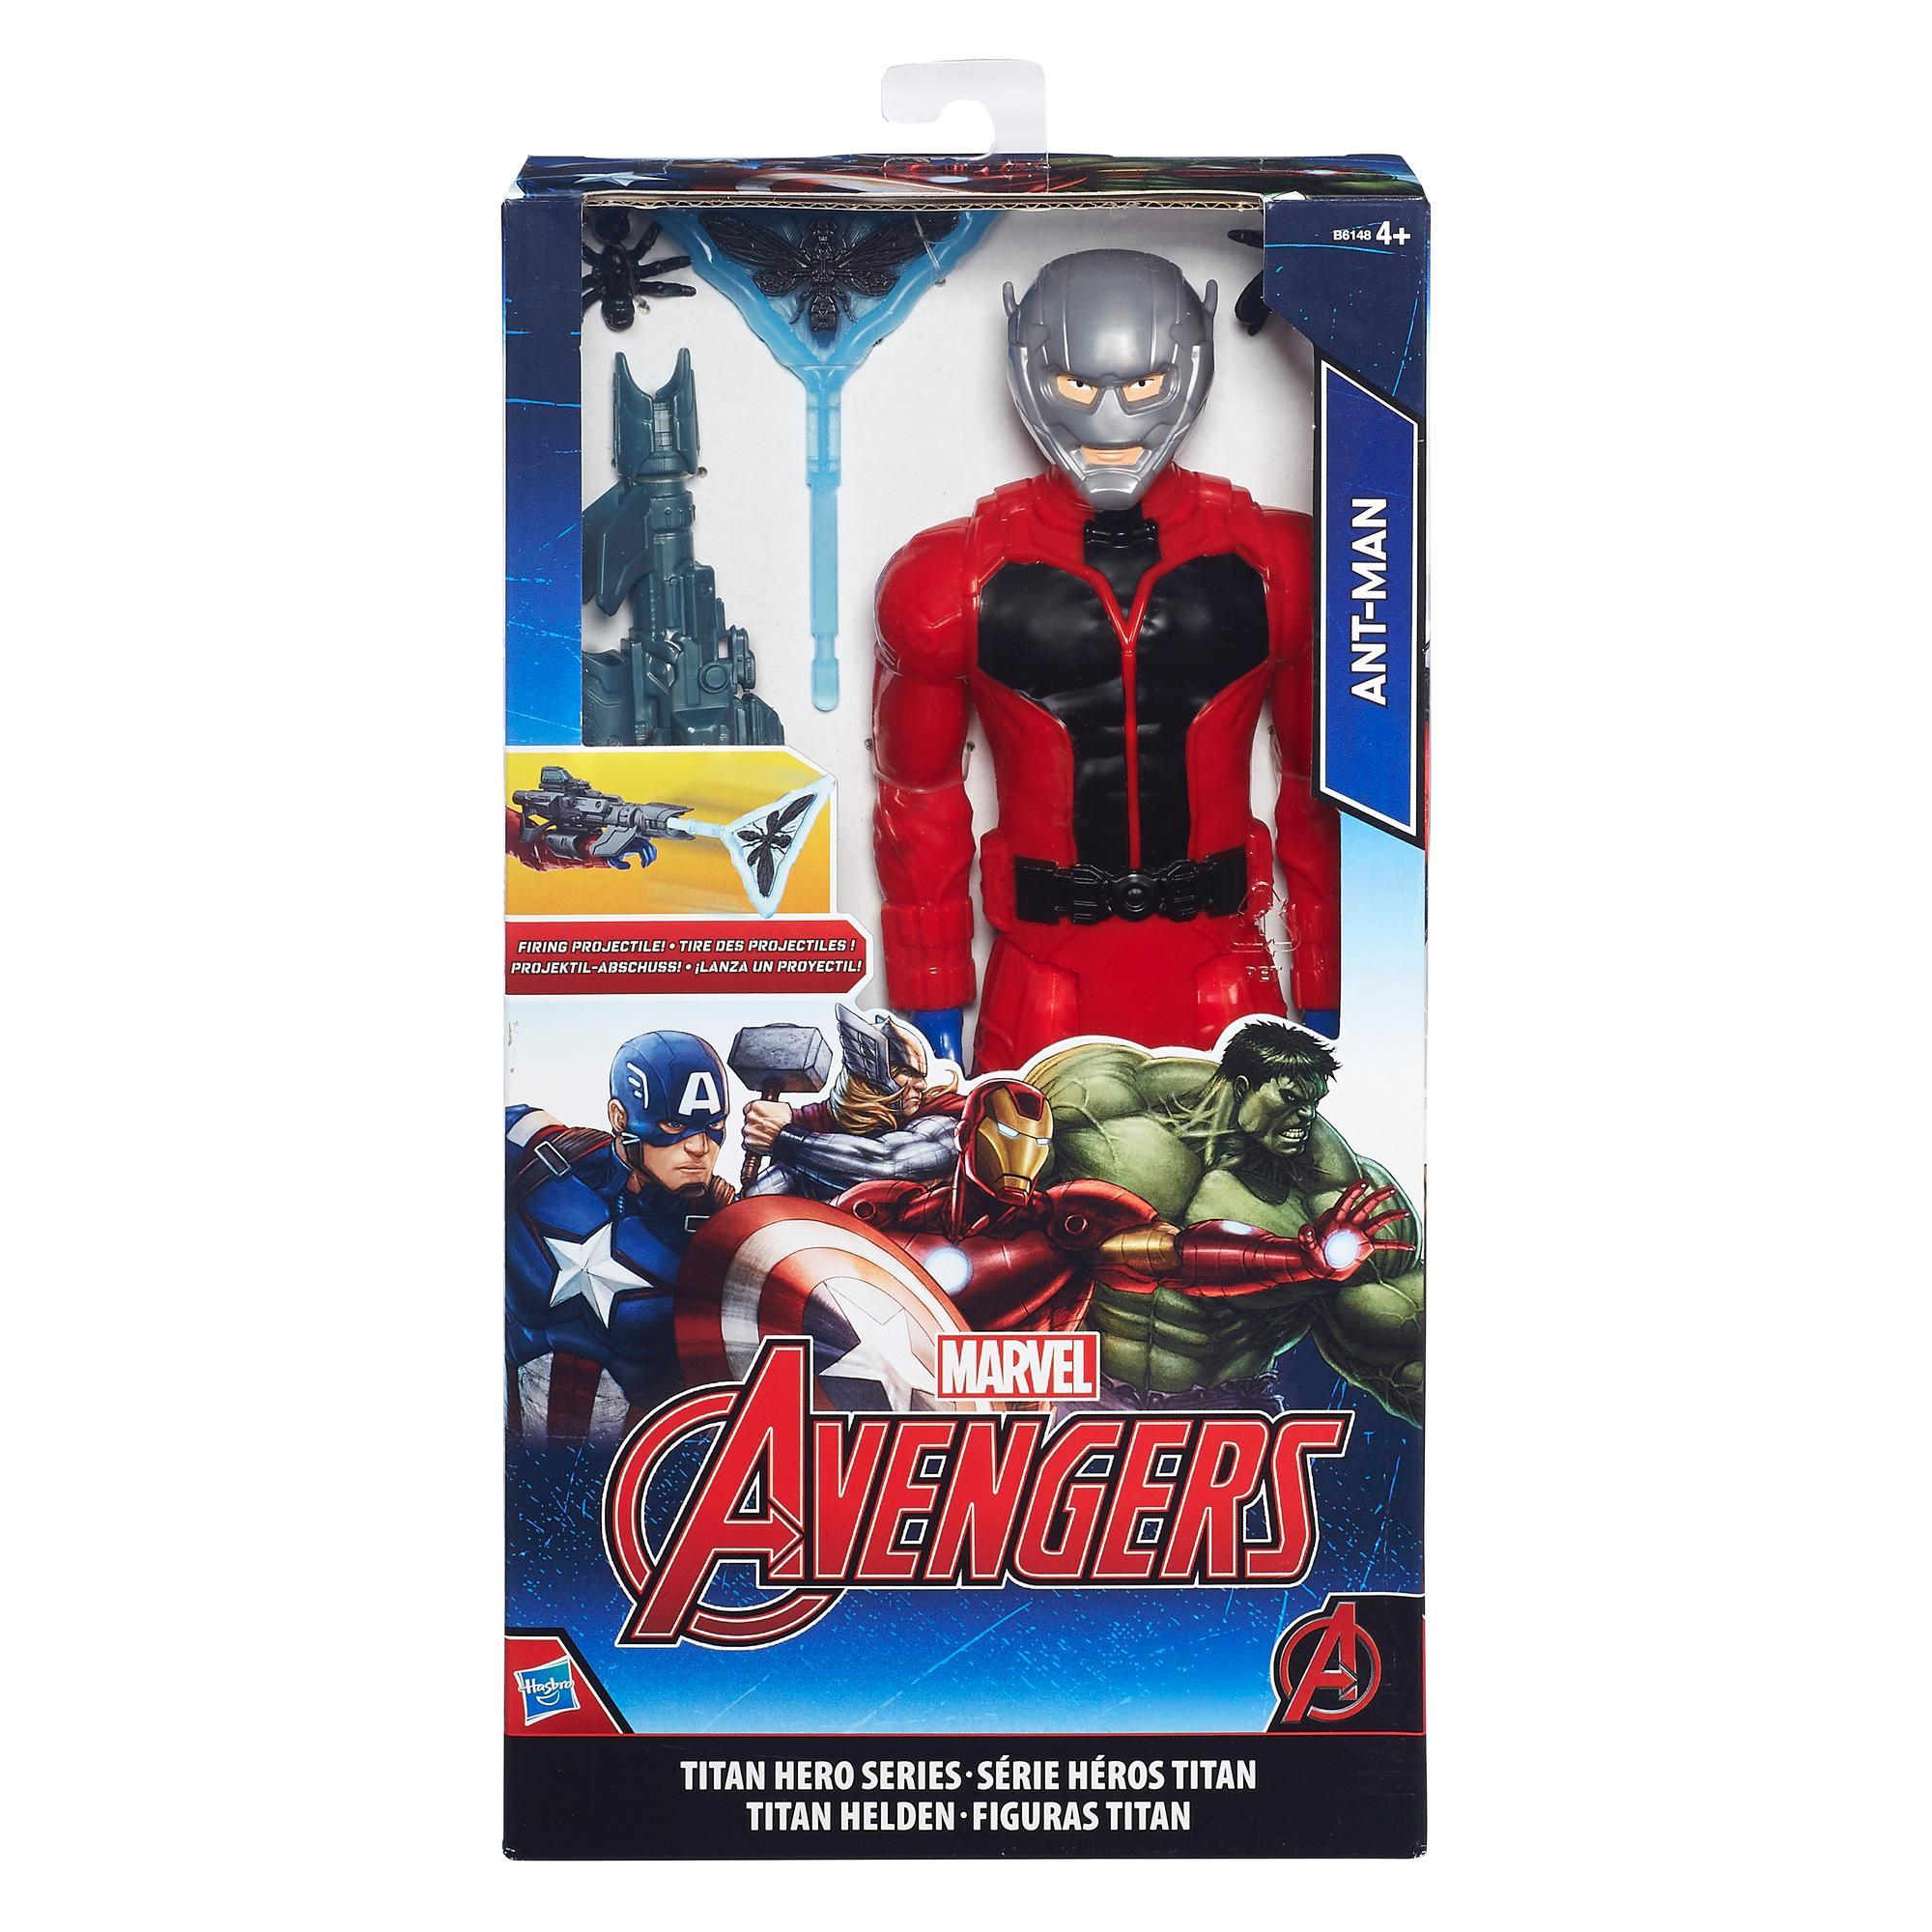 Avengers  Ant-Man Titan Hero & Gear Eu Solid